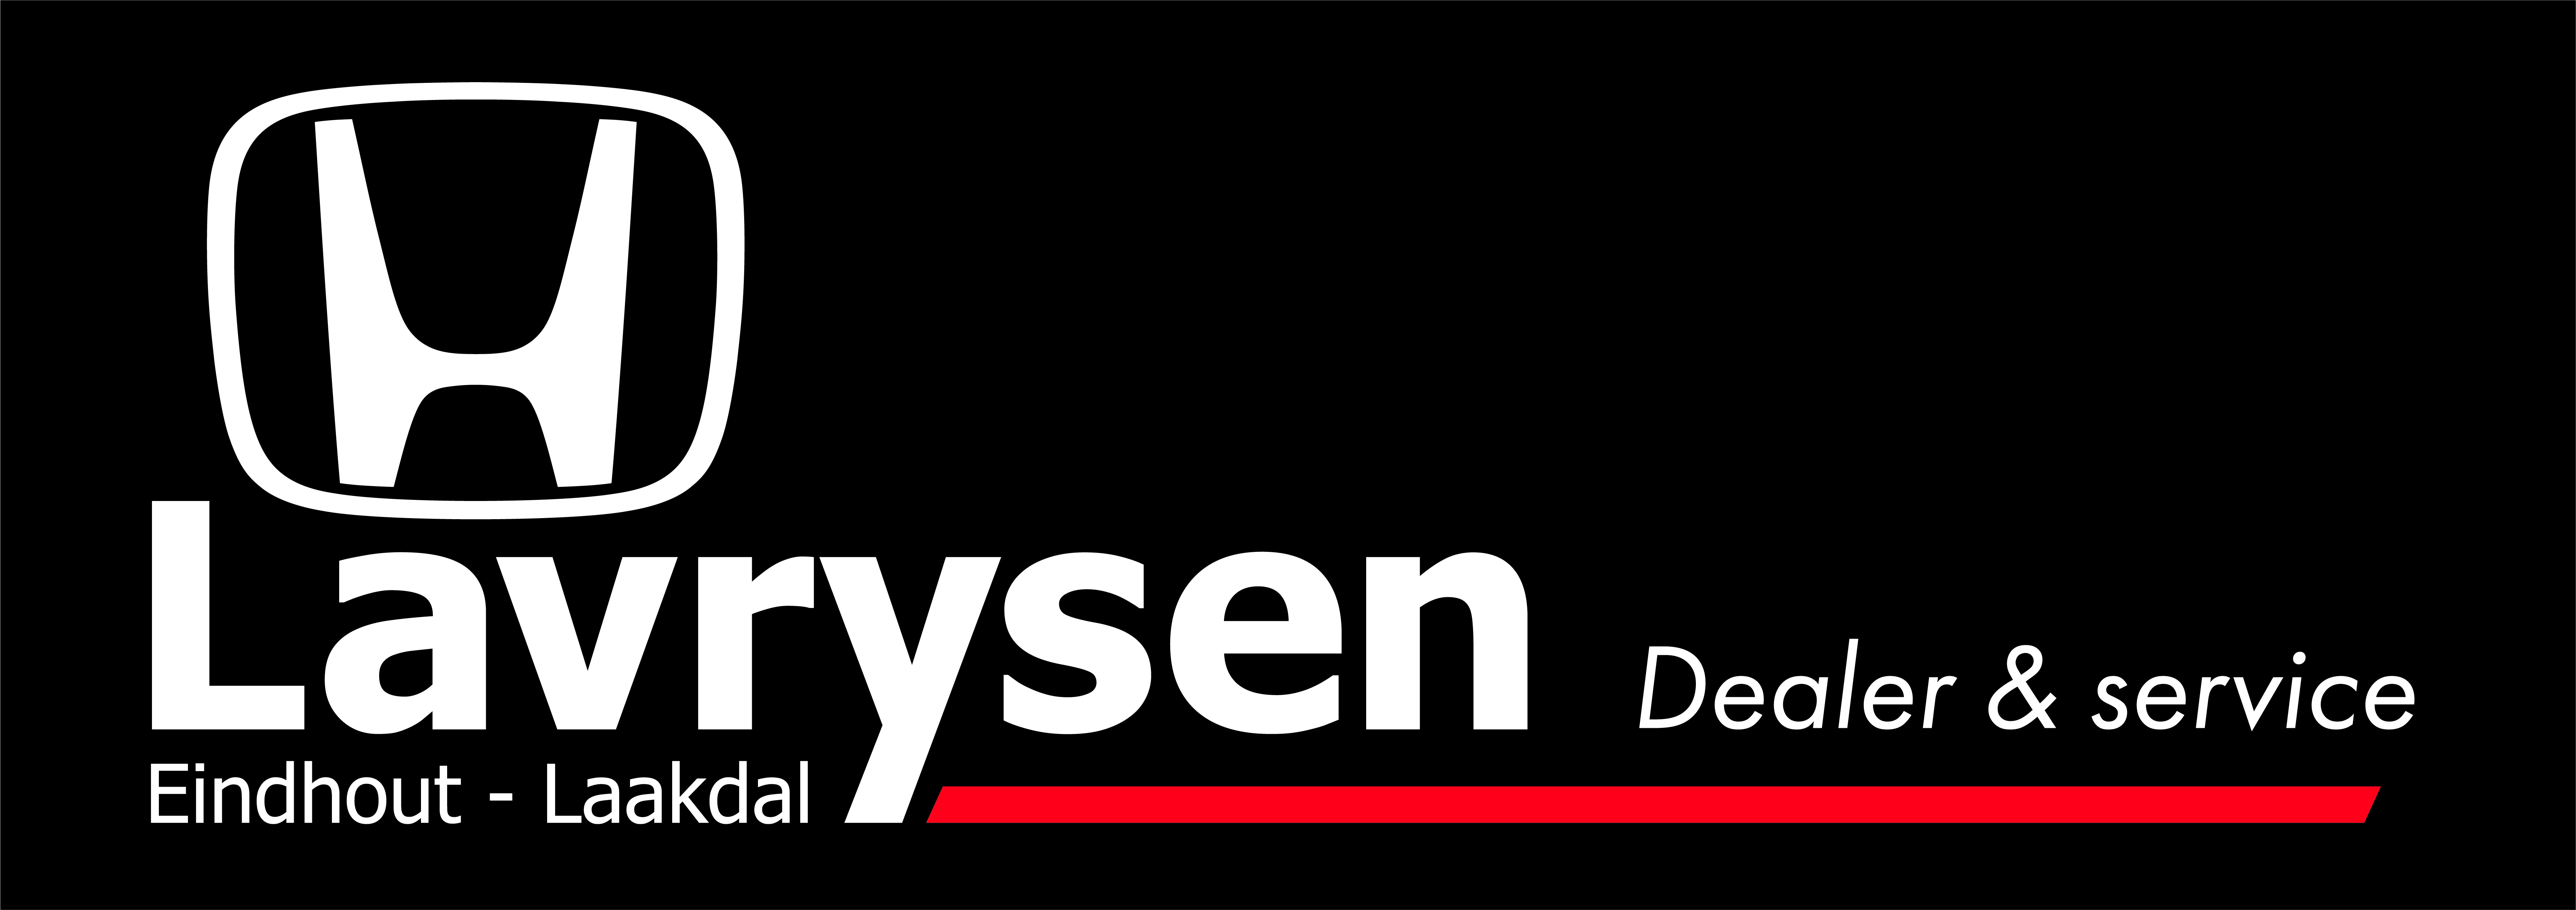 Lavrysen_dealer-service_neg.jpg